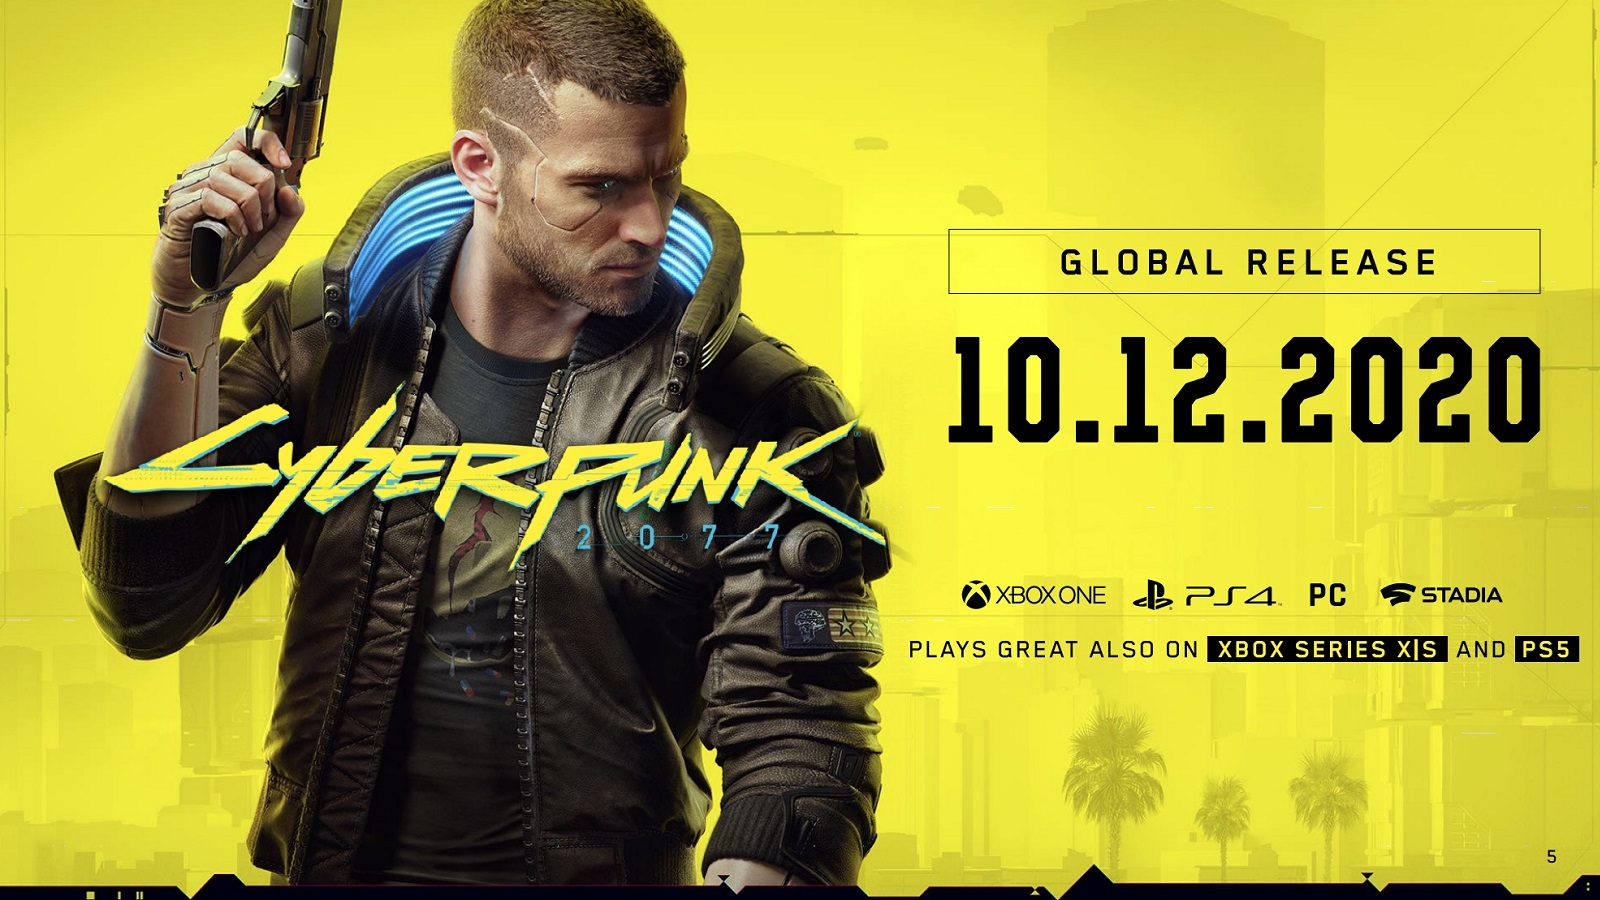 Точка невозврата: CD Projekt RED ещё раз пообещала больше не переносить Cyberpunk 2077